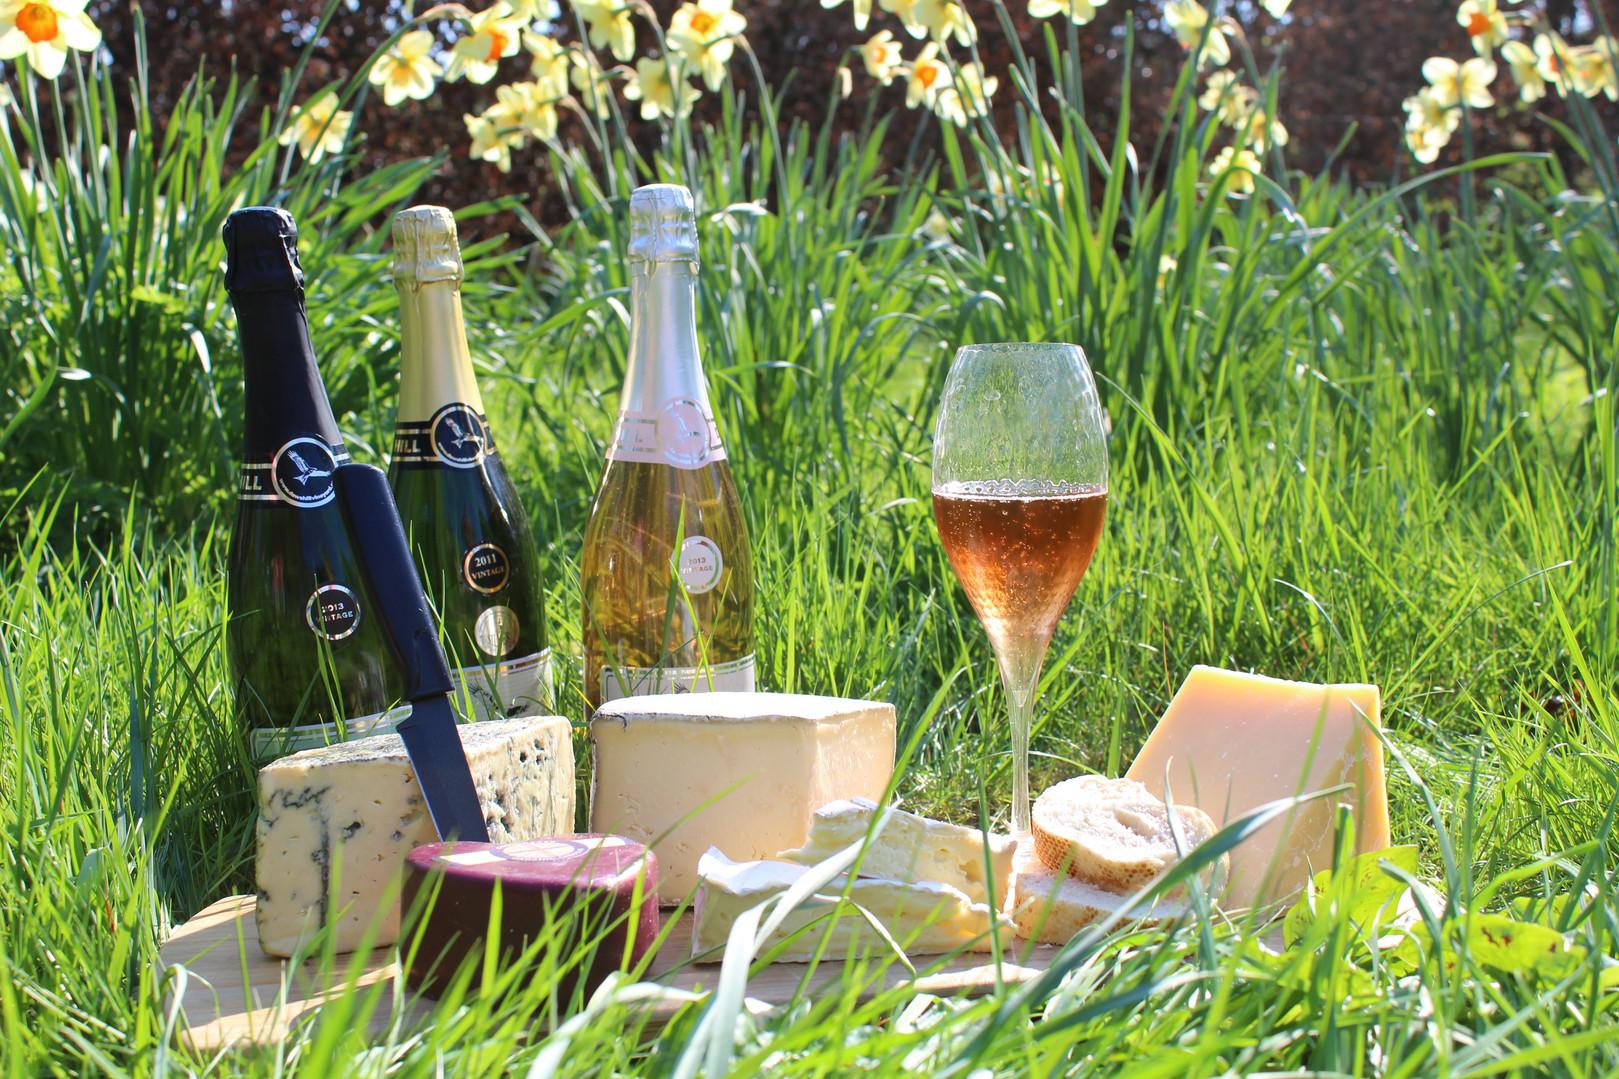 Wine & Cheese Tasting Packs